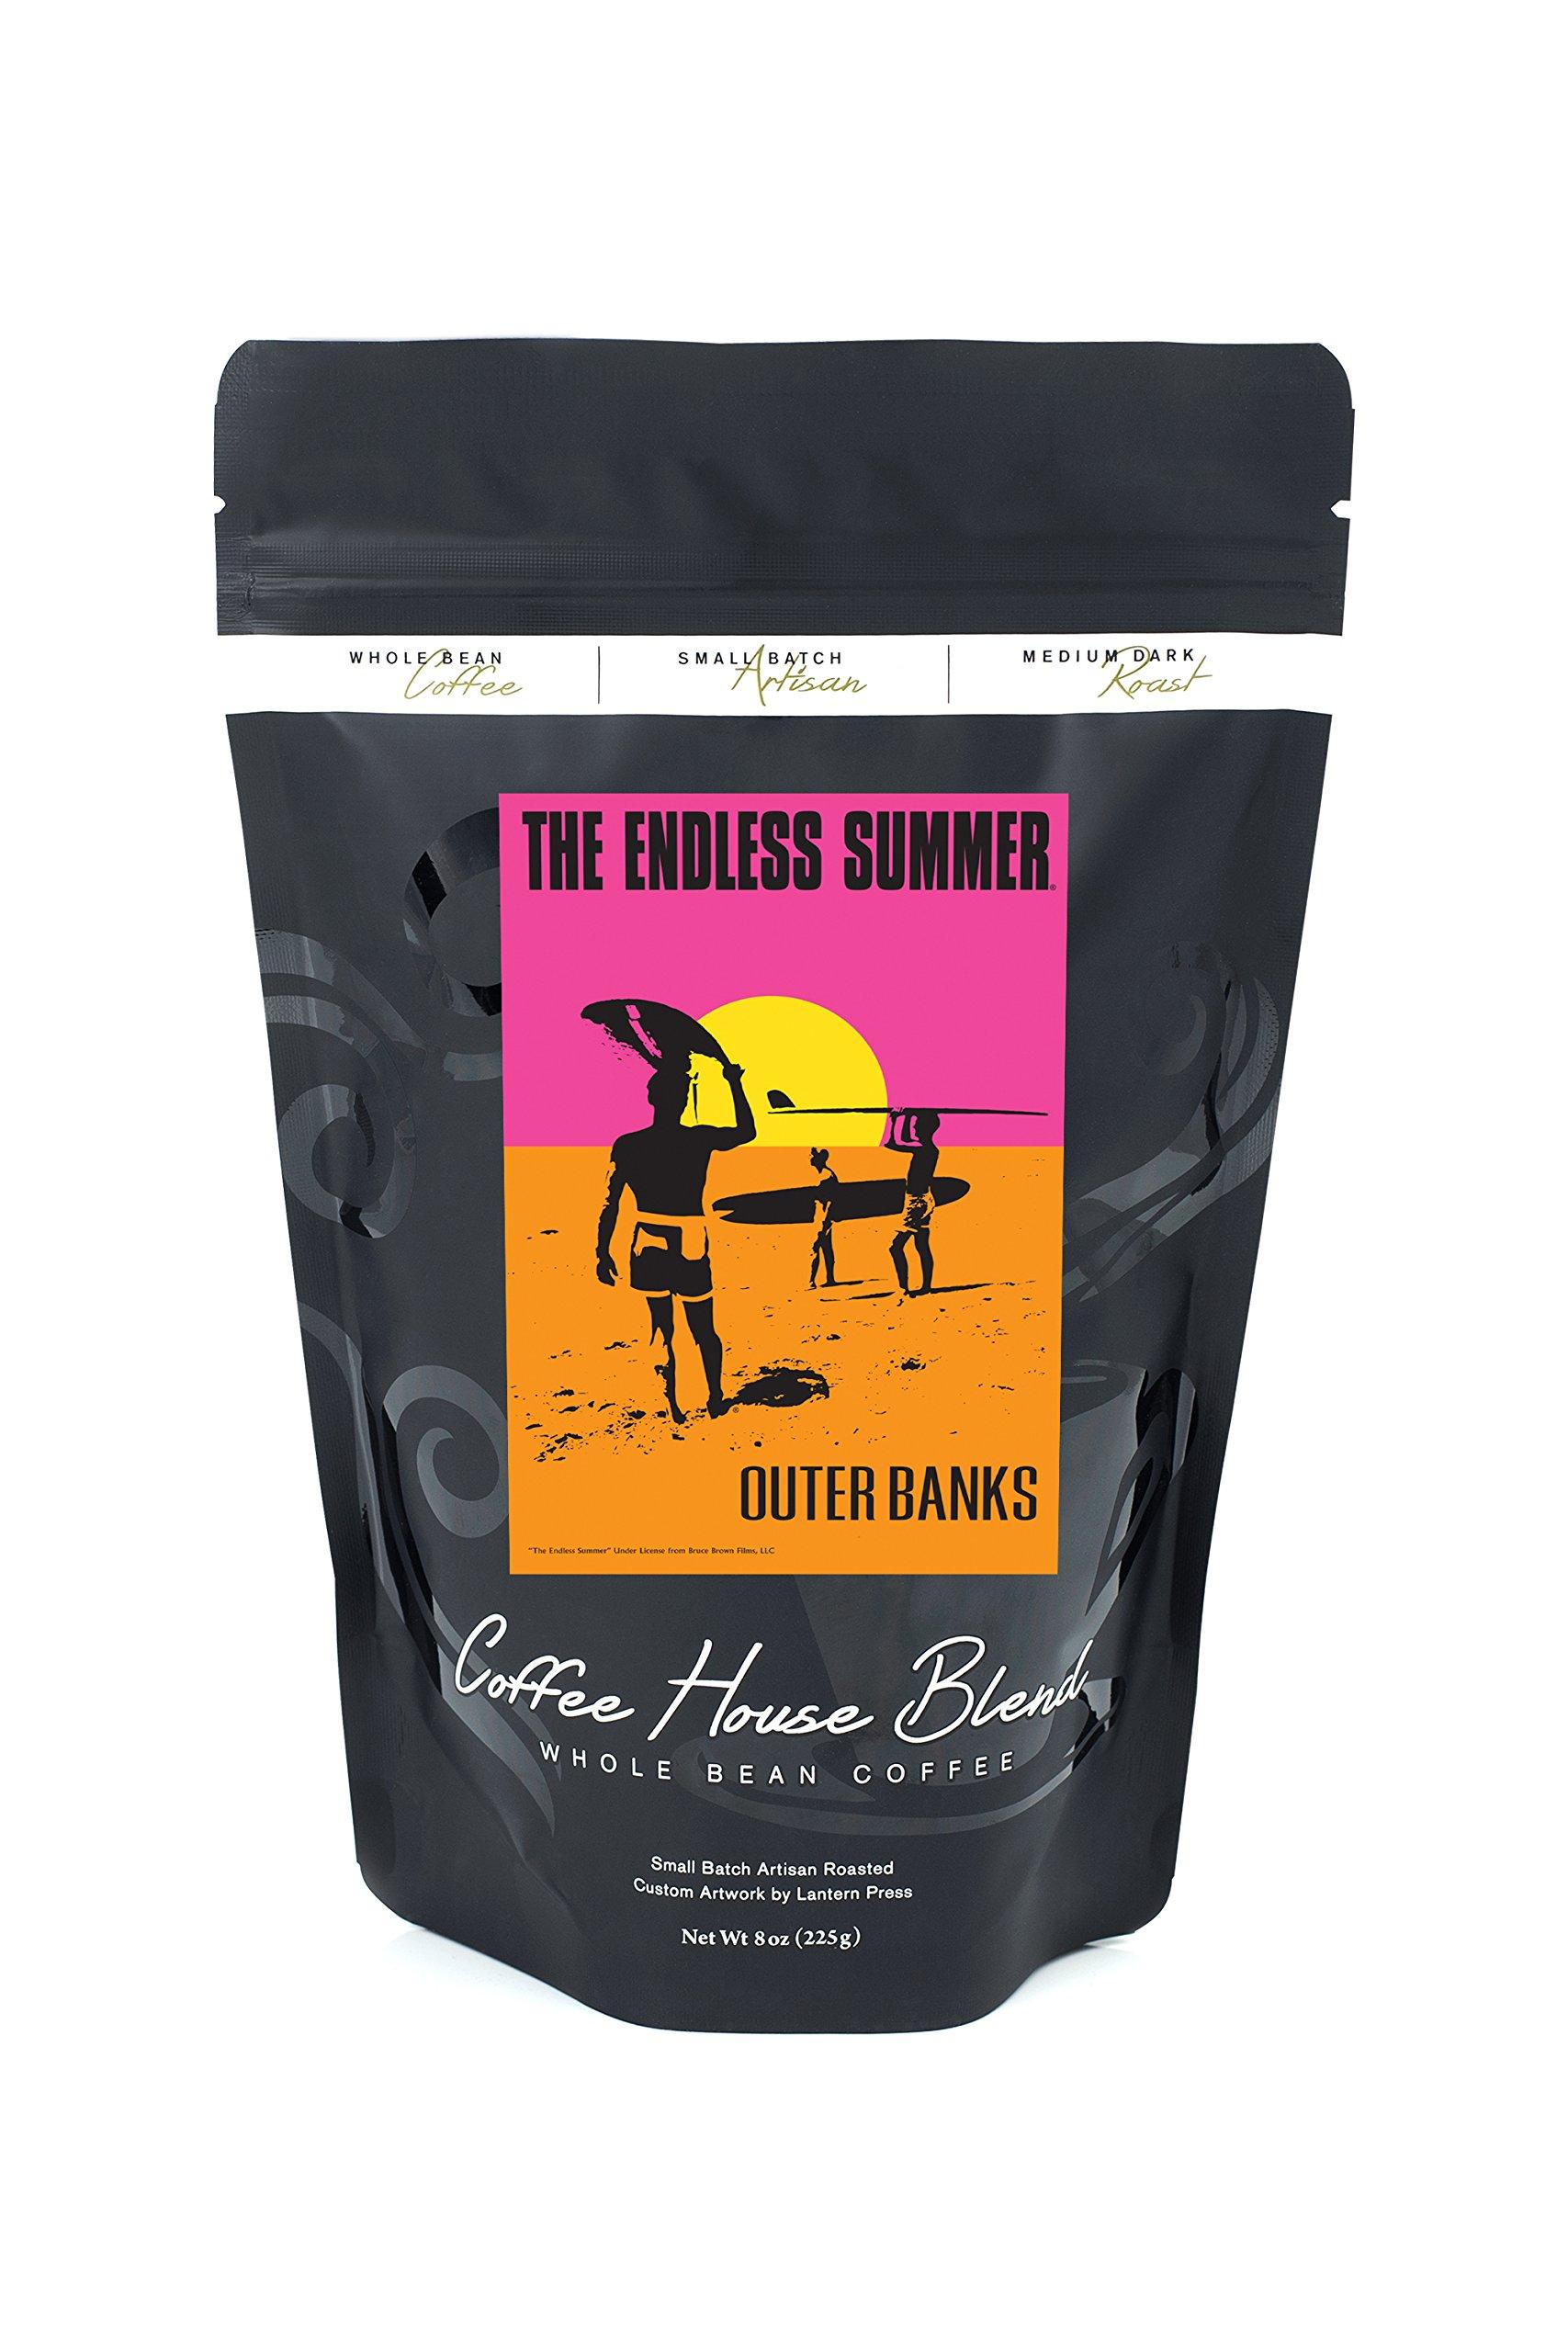 Outer Banks, North Carolina - The Endless Summer - Original Movie Poster (8oz Whole Bean Small Batch Artisan Coffee - Bold & Strong Medium Dark Roast w/ Artwork) by Lantern Press